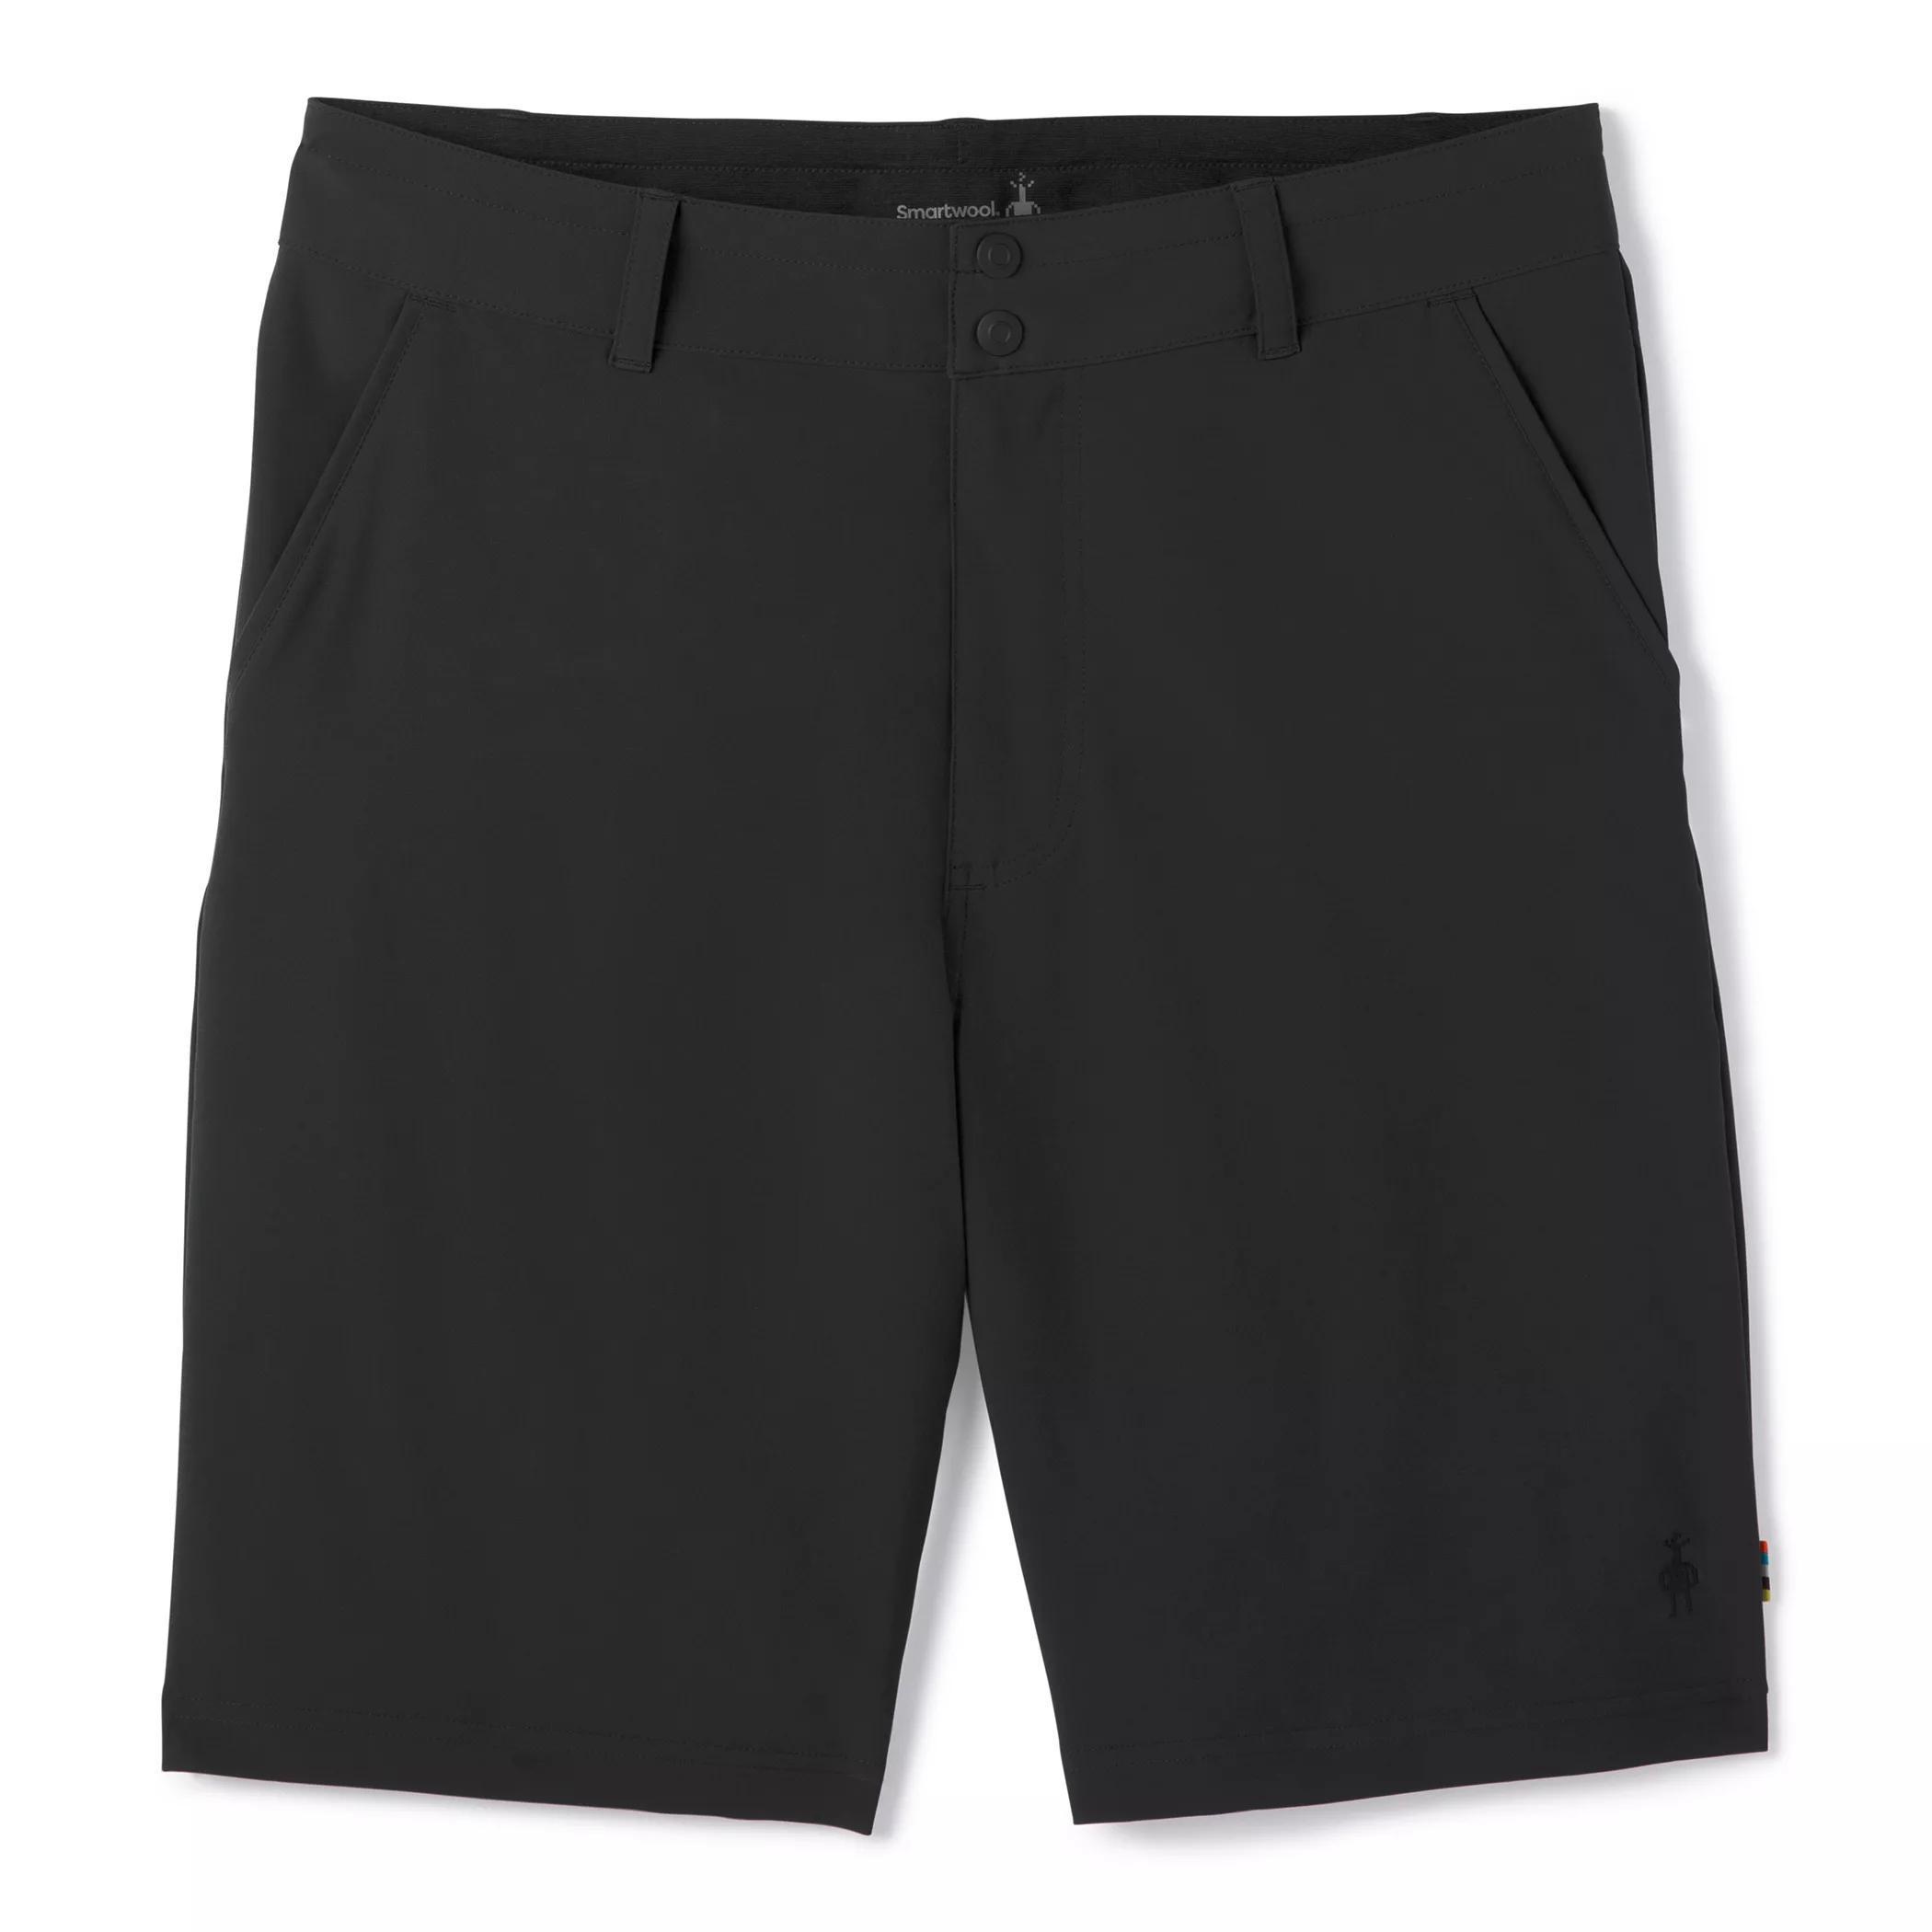 Merino Sport 10in Short - Men's